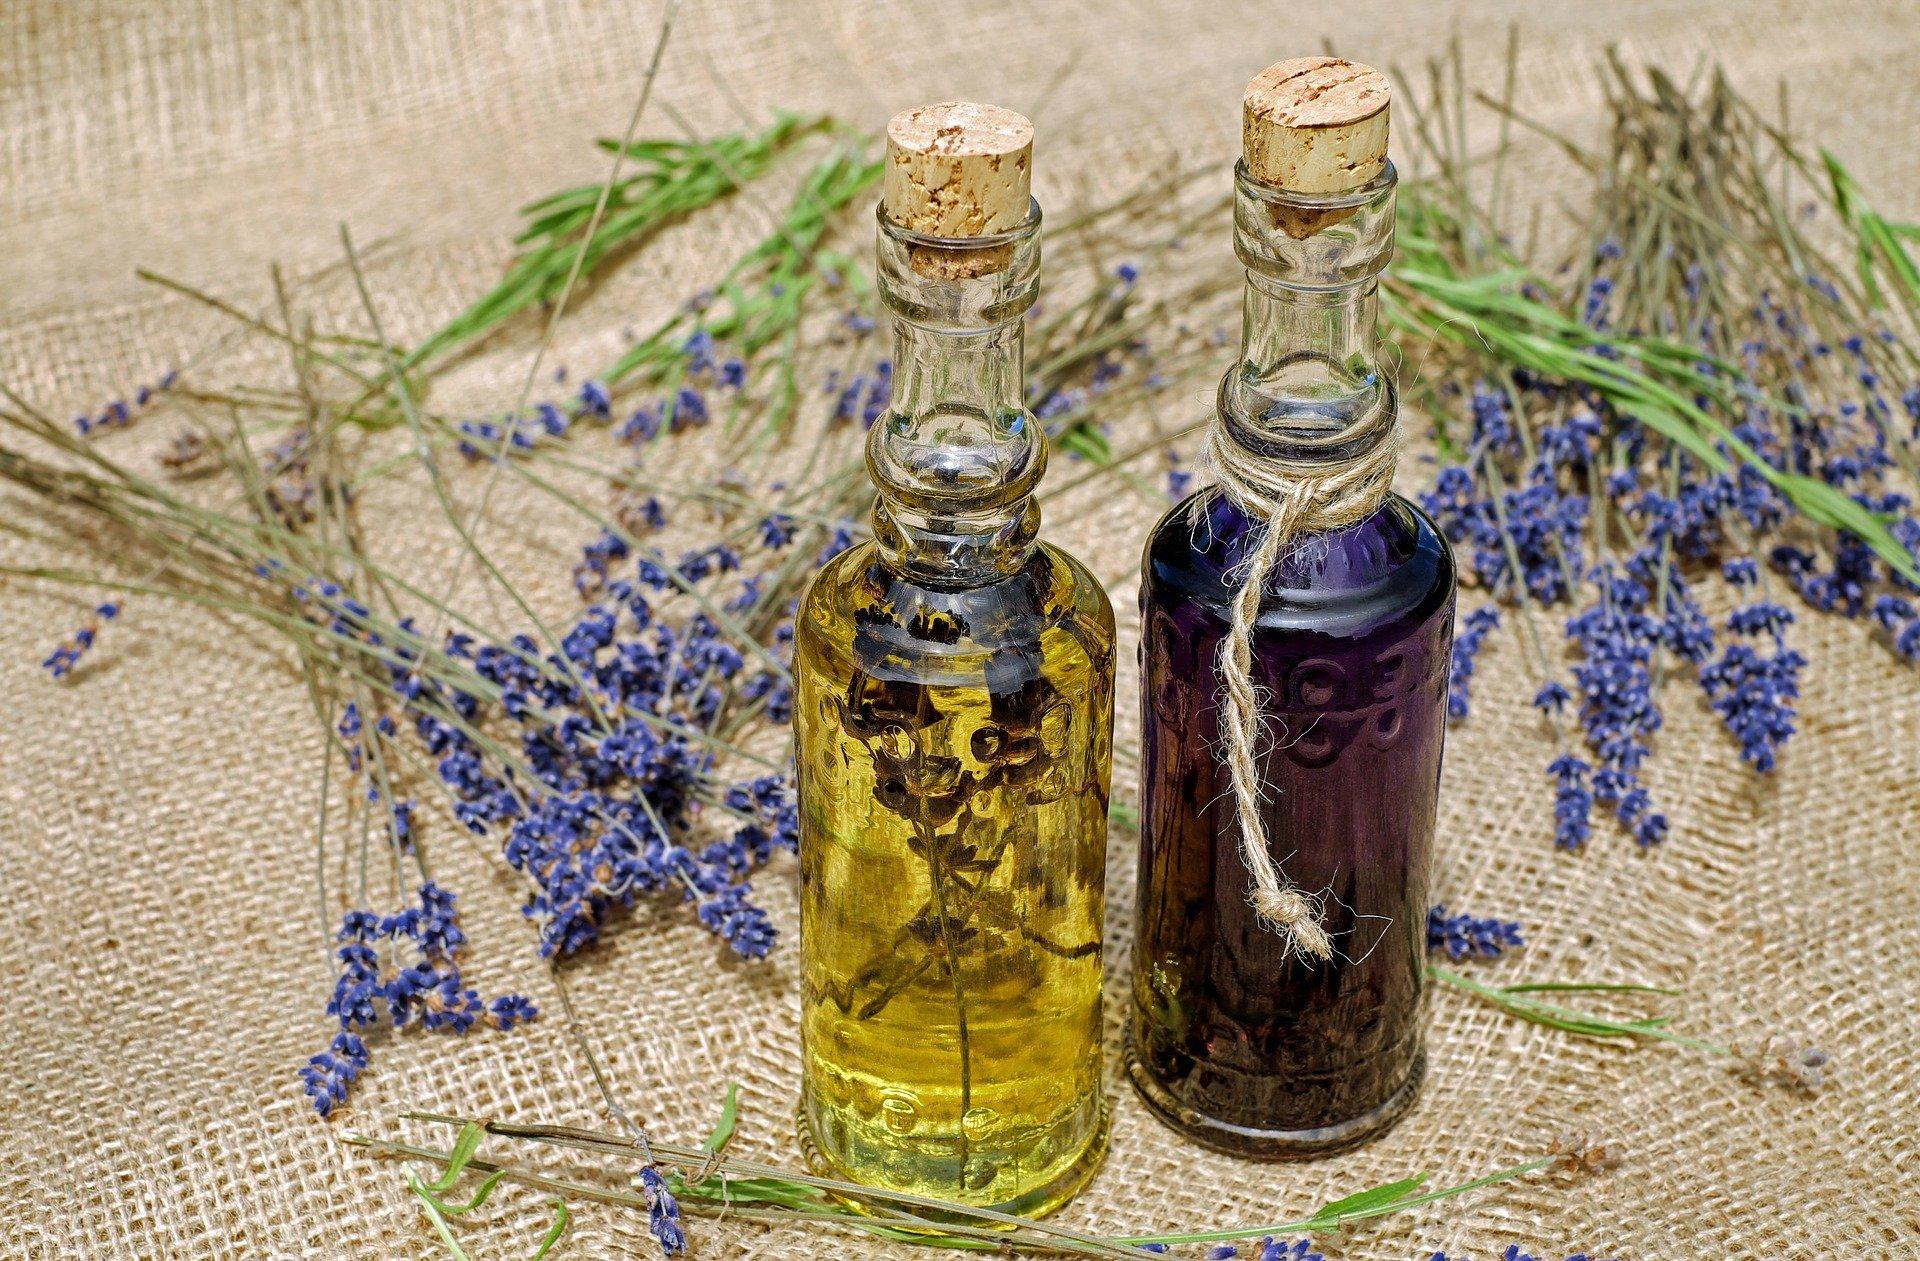 Öl mit Lavendel